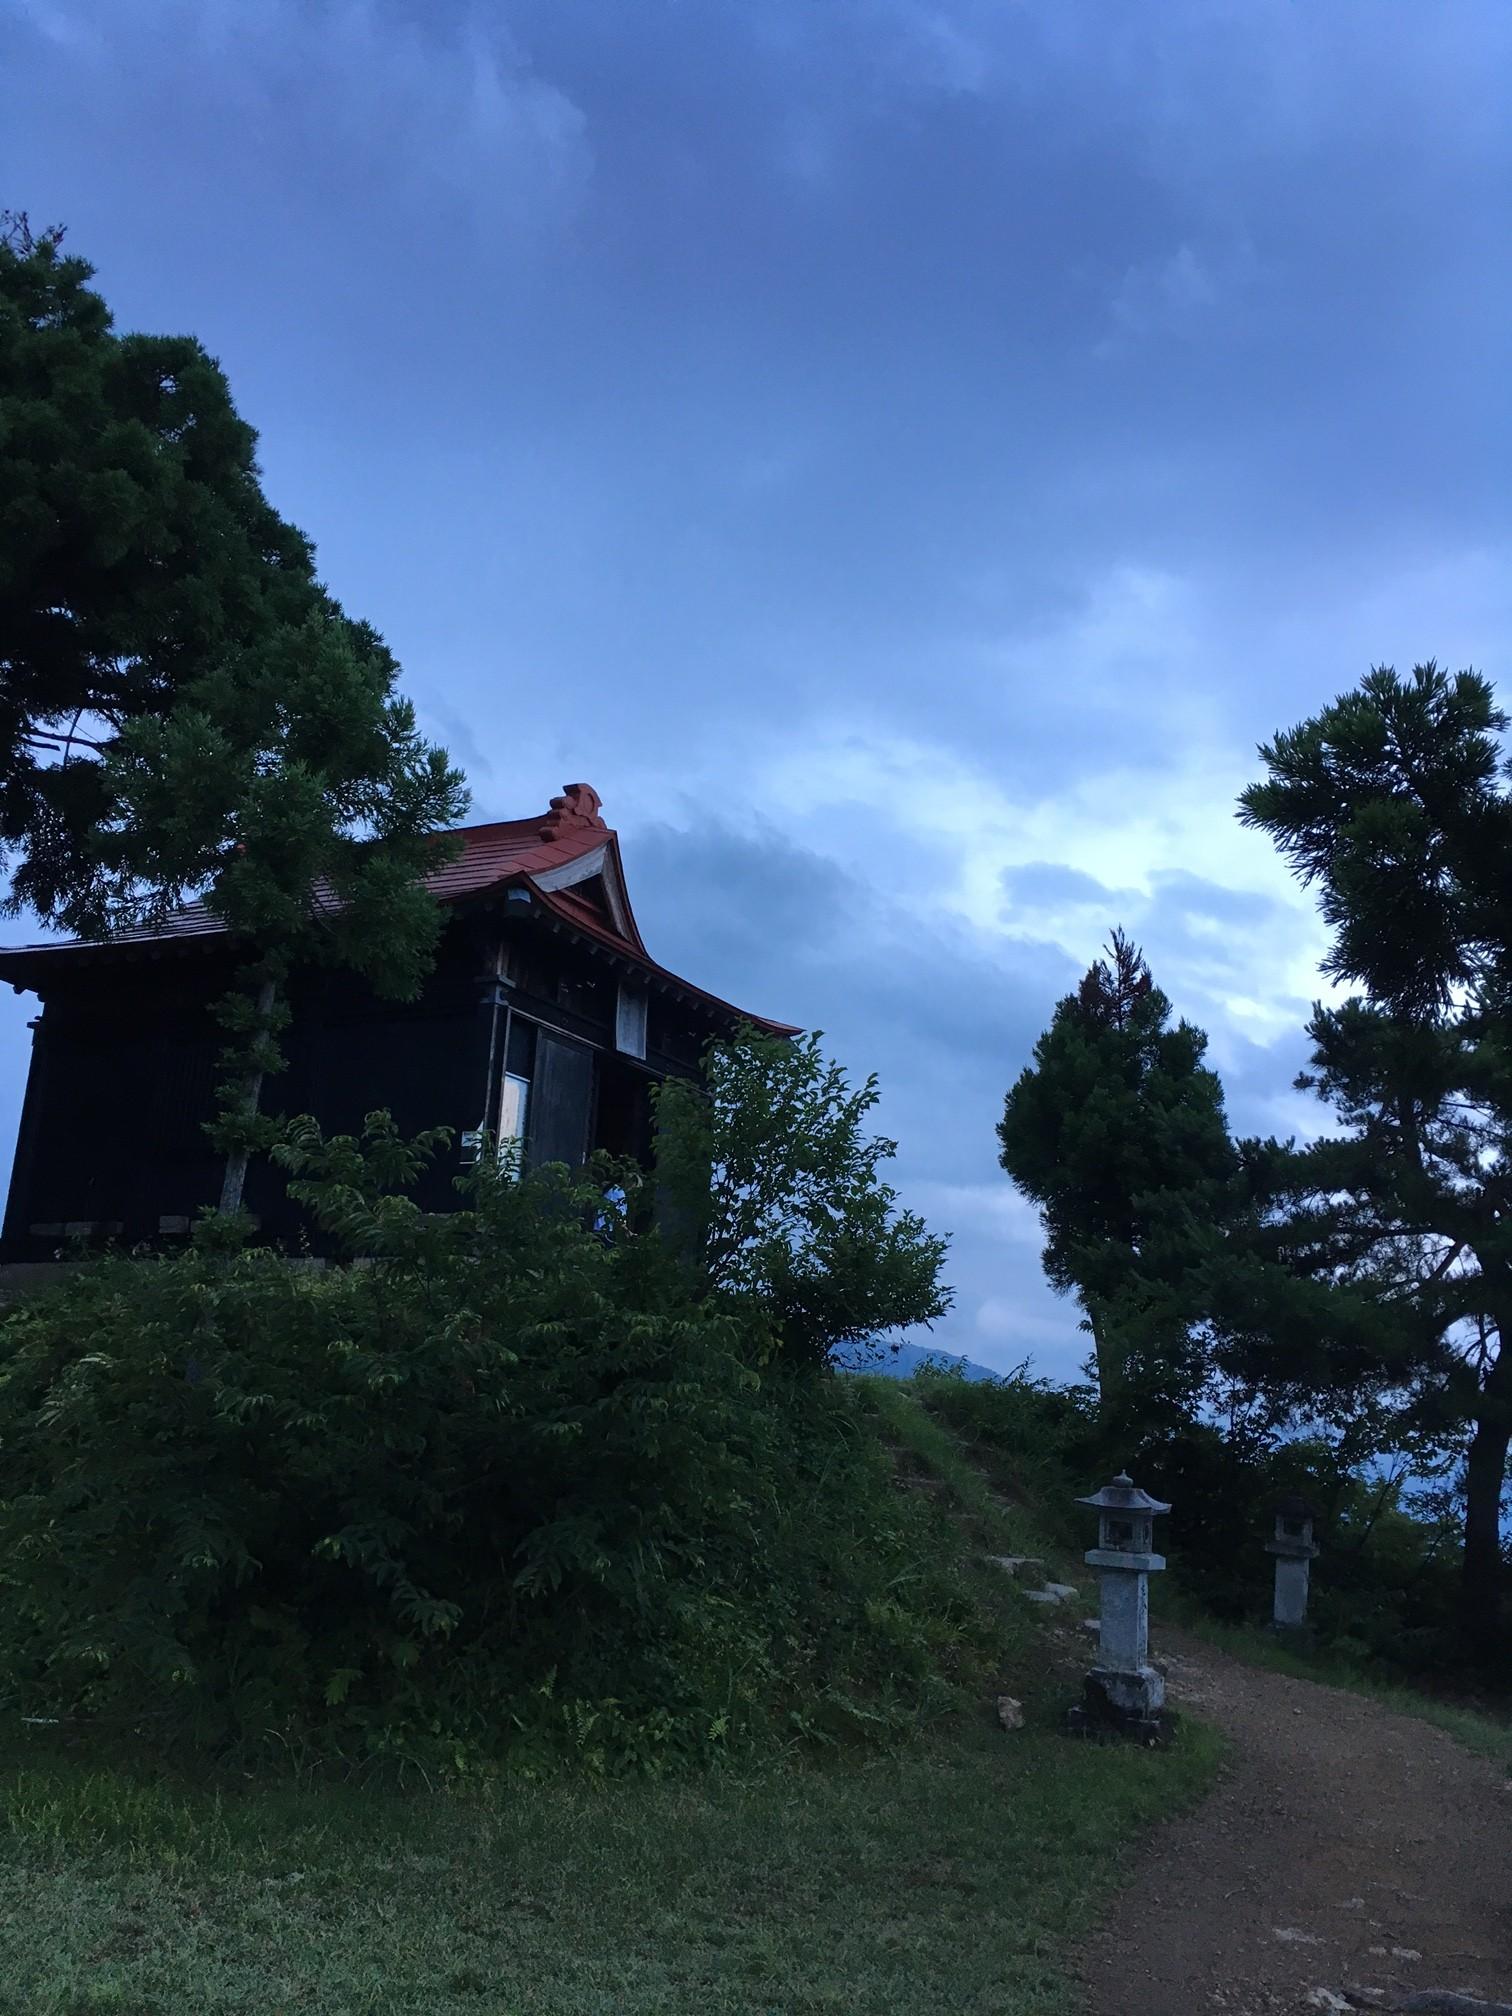 2017.7.18 tue.兼続公祭りな朝の坂戸山 BY HUNTER-SHISHIMAI 南魚沼市